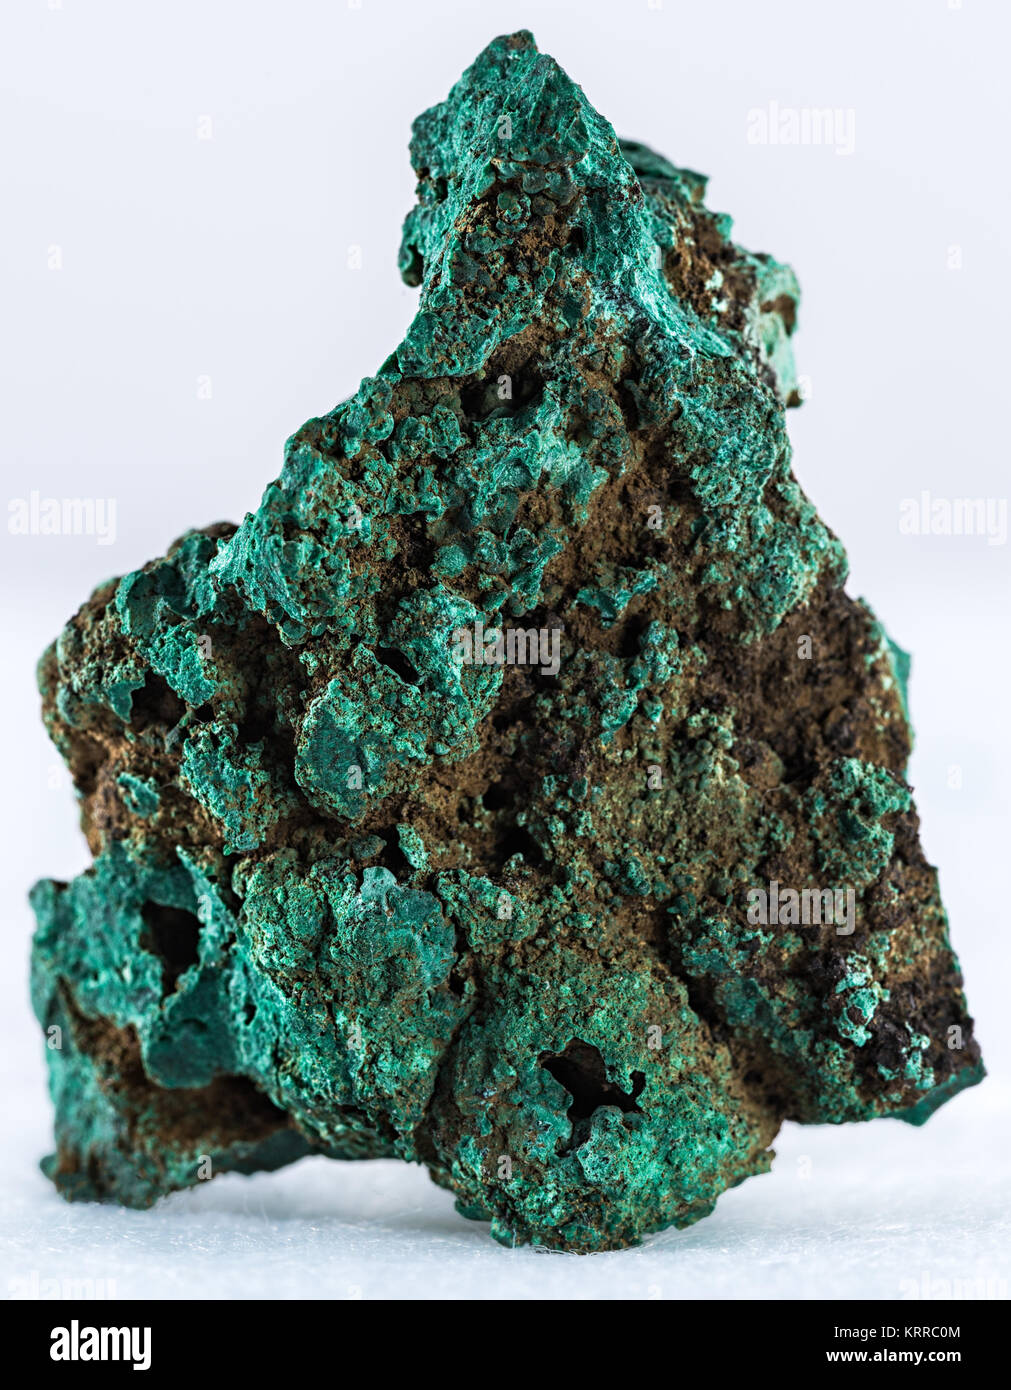 malachite mineral and nature stock photos amp malachite